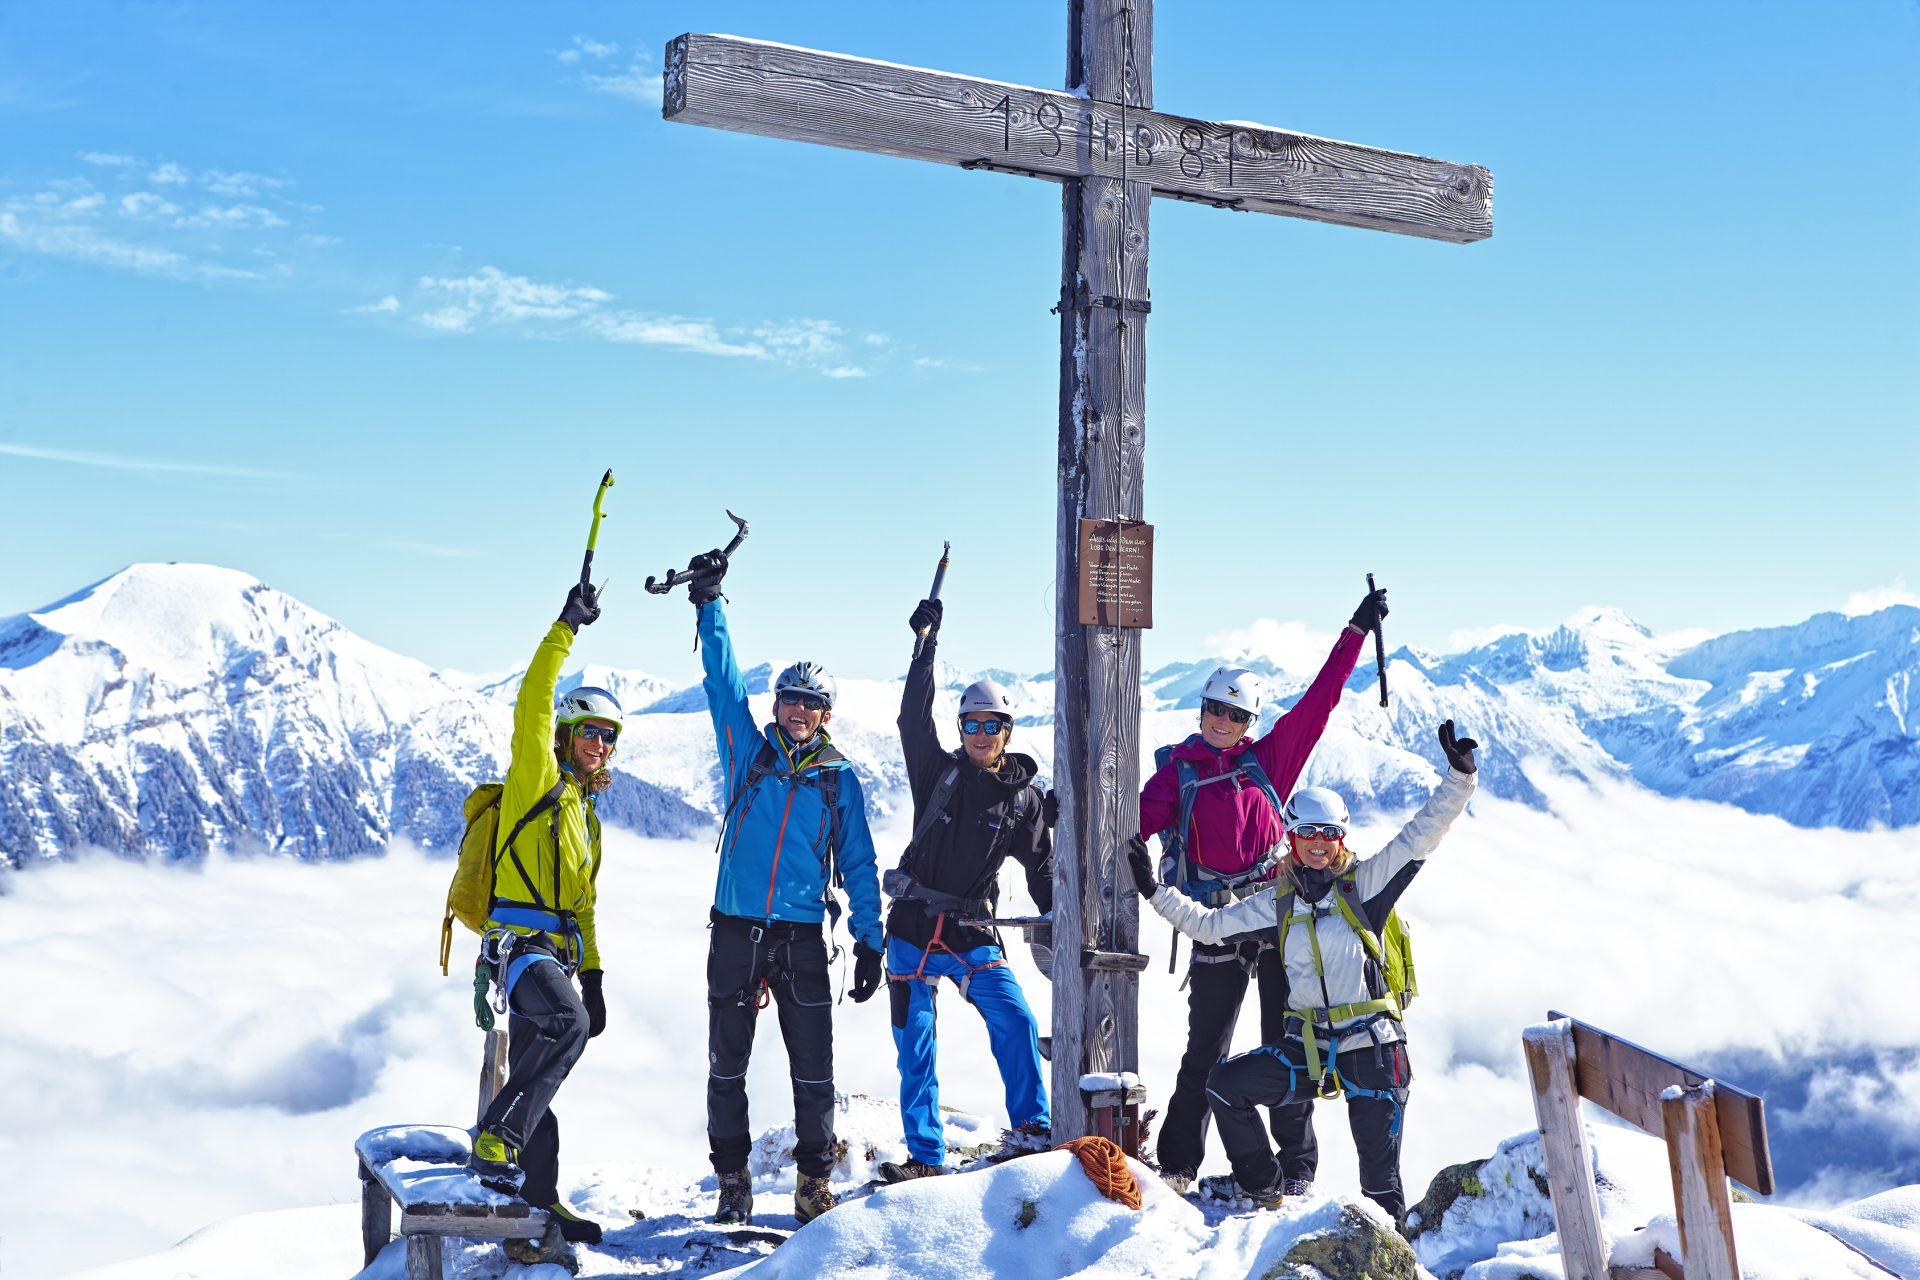 Fünf Kletterer haben sich um ein Gipfelkreuz versammelt. Fotograf: Jörg Saibou, Köln.